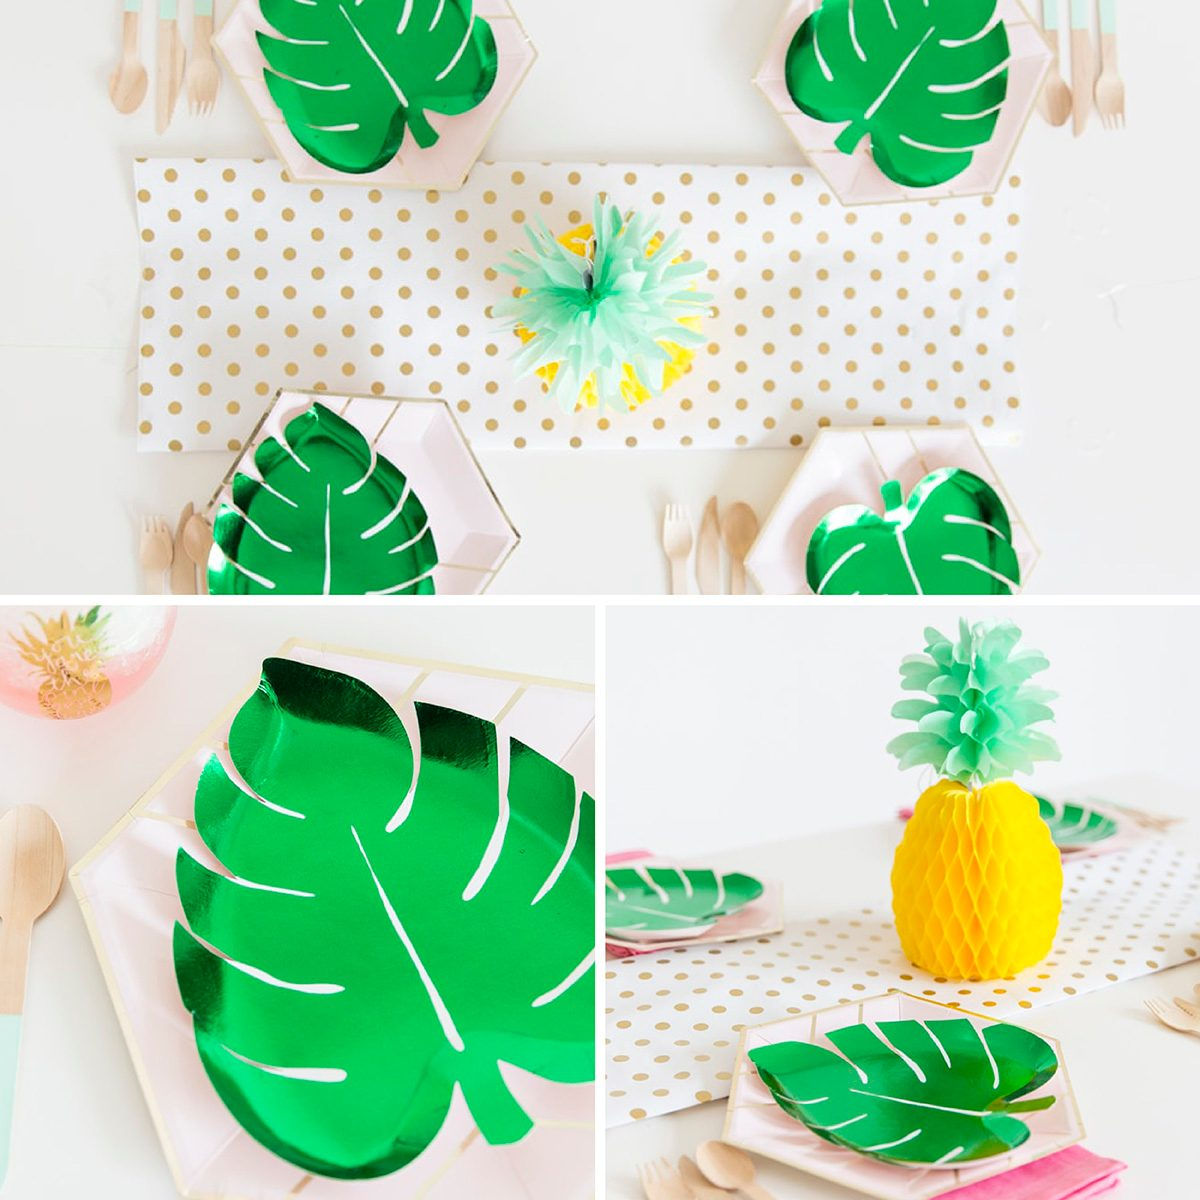 Pineapple table decorating ideas